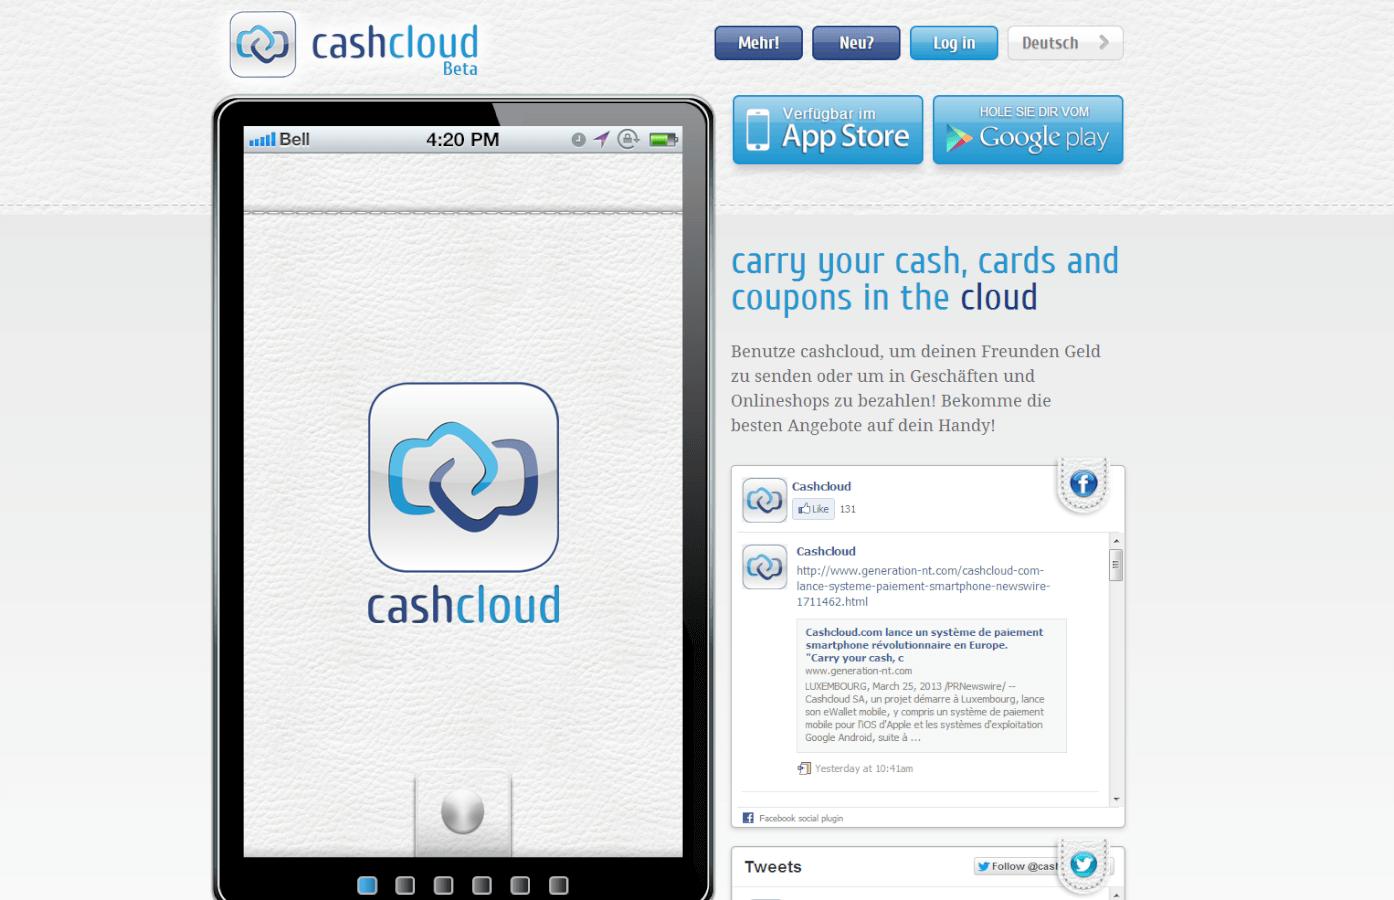 cashcloud, Banking IT Innovation Award 2014 !